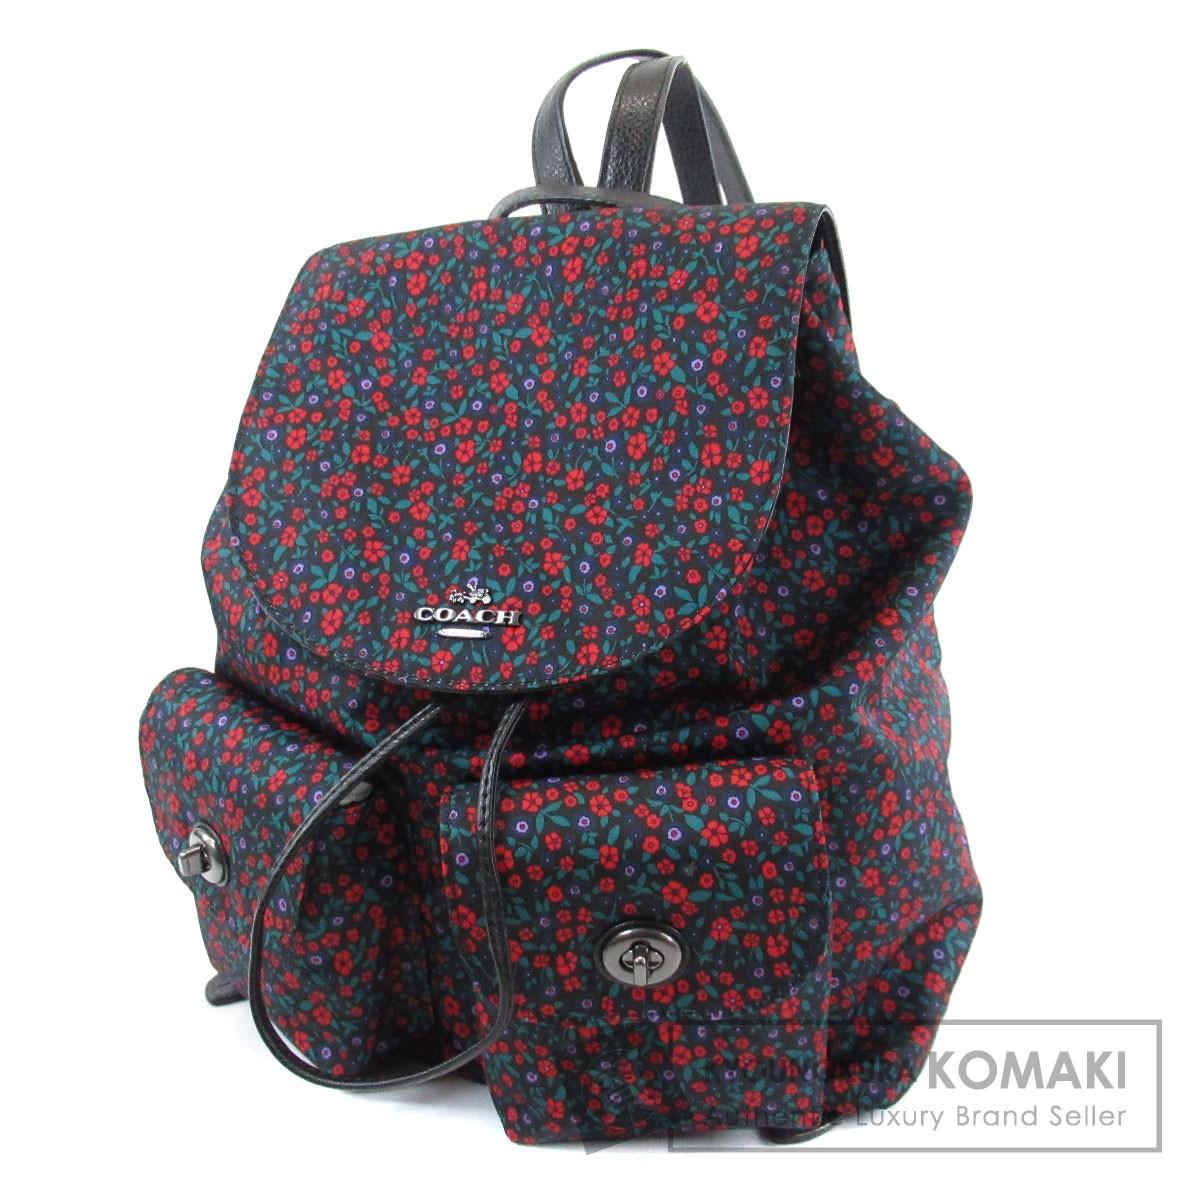 COACH F59434 リュック・デイパック キャンバス レディース 【中古】【コーチ】